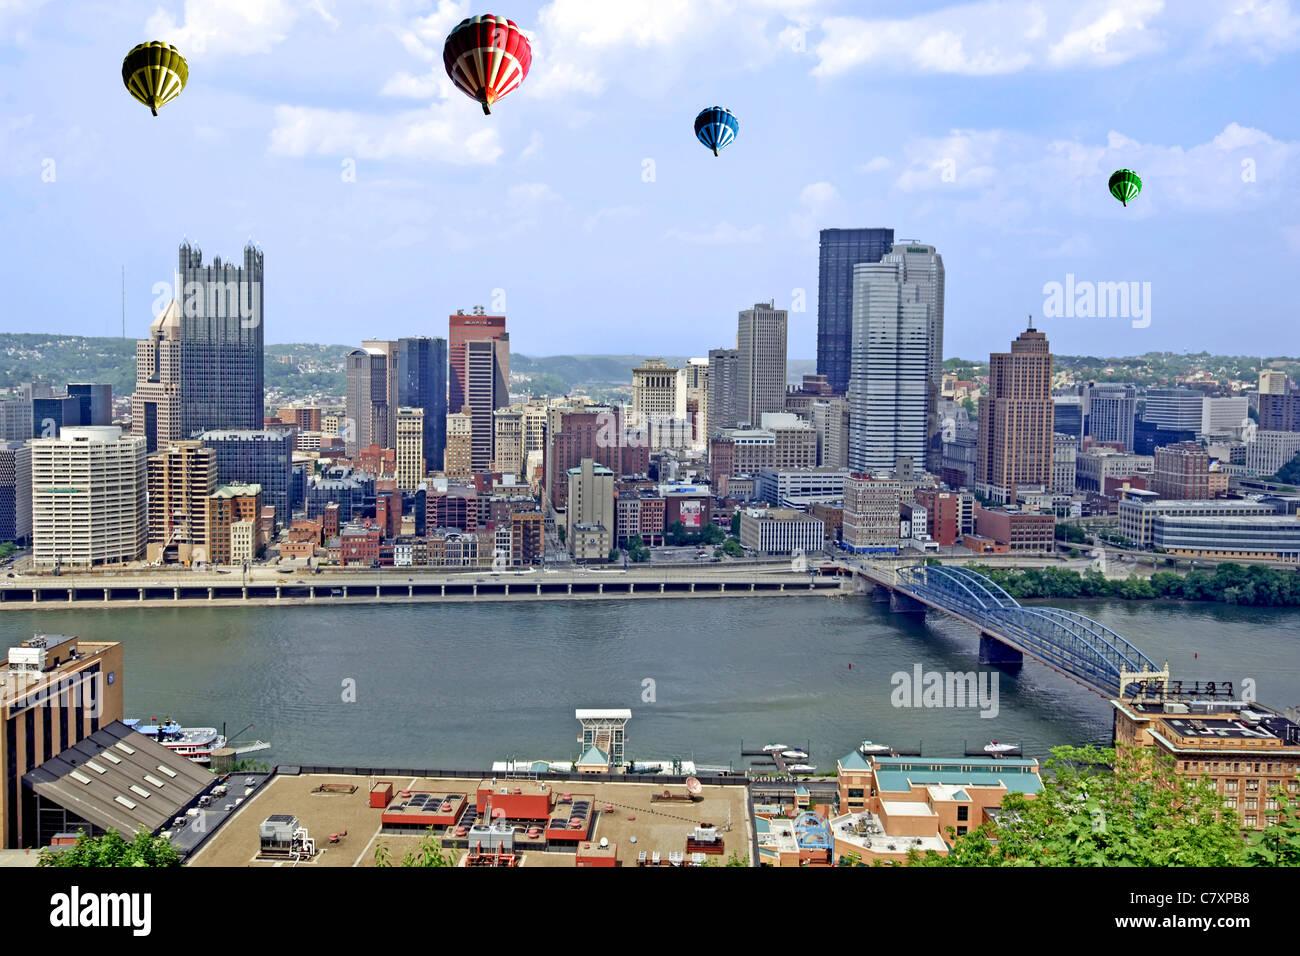 Hot Air Balloons Over Pittsburgh City Pennsylvania Stock